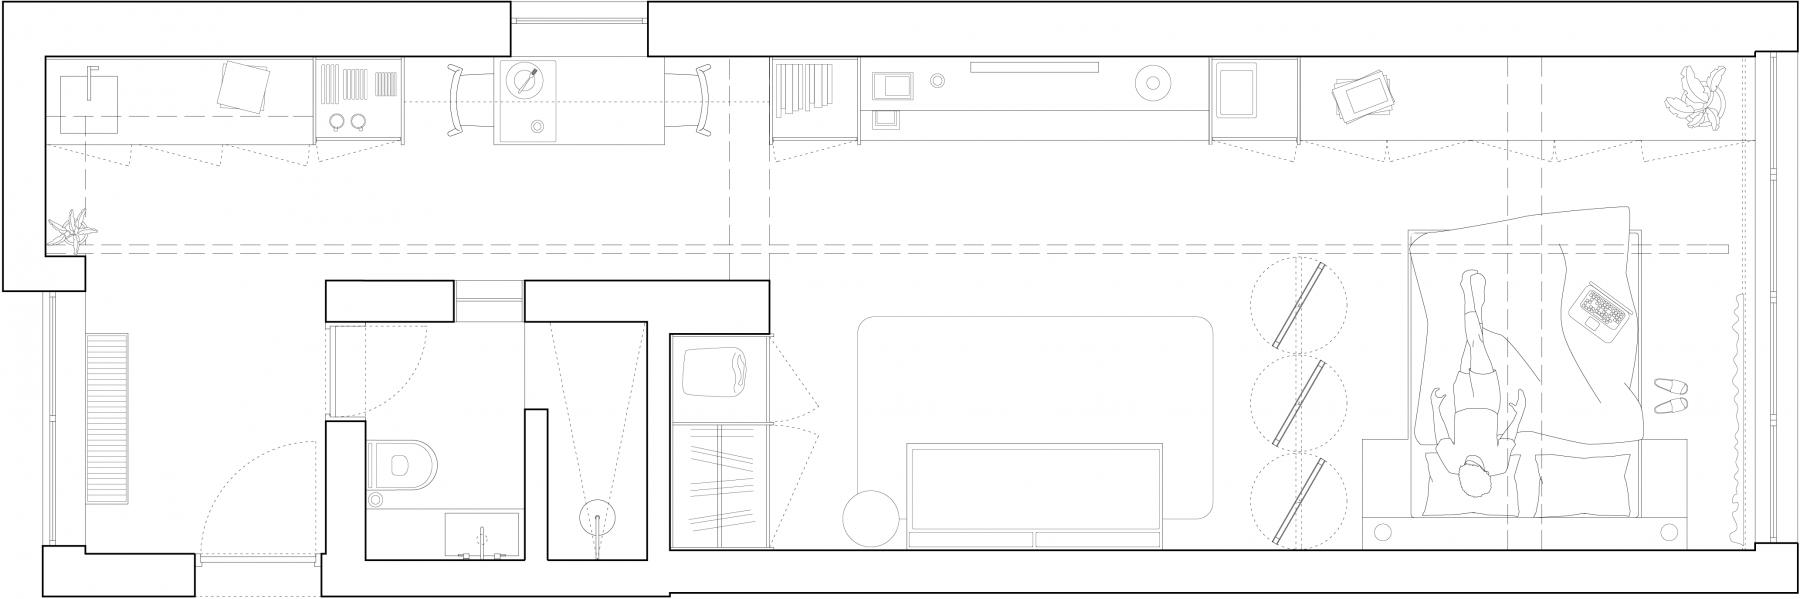 dc ad equador 201 architecture plan